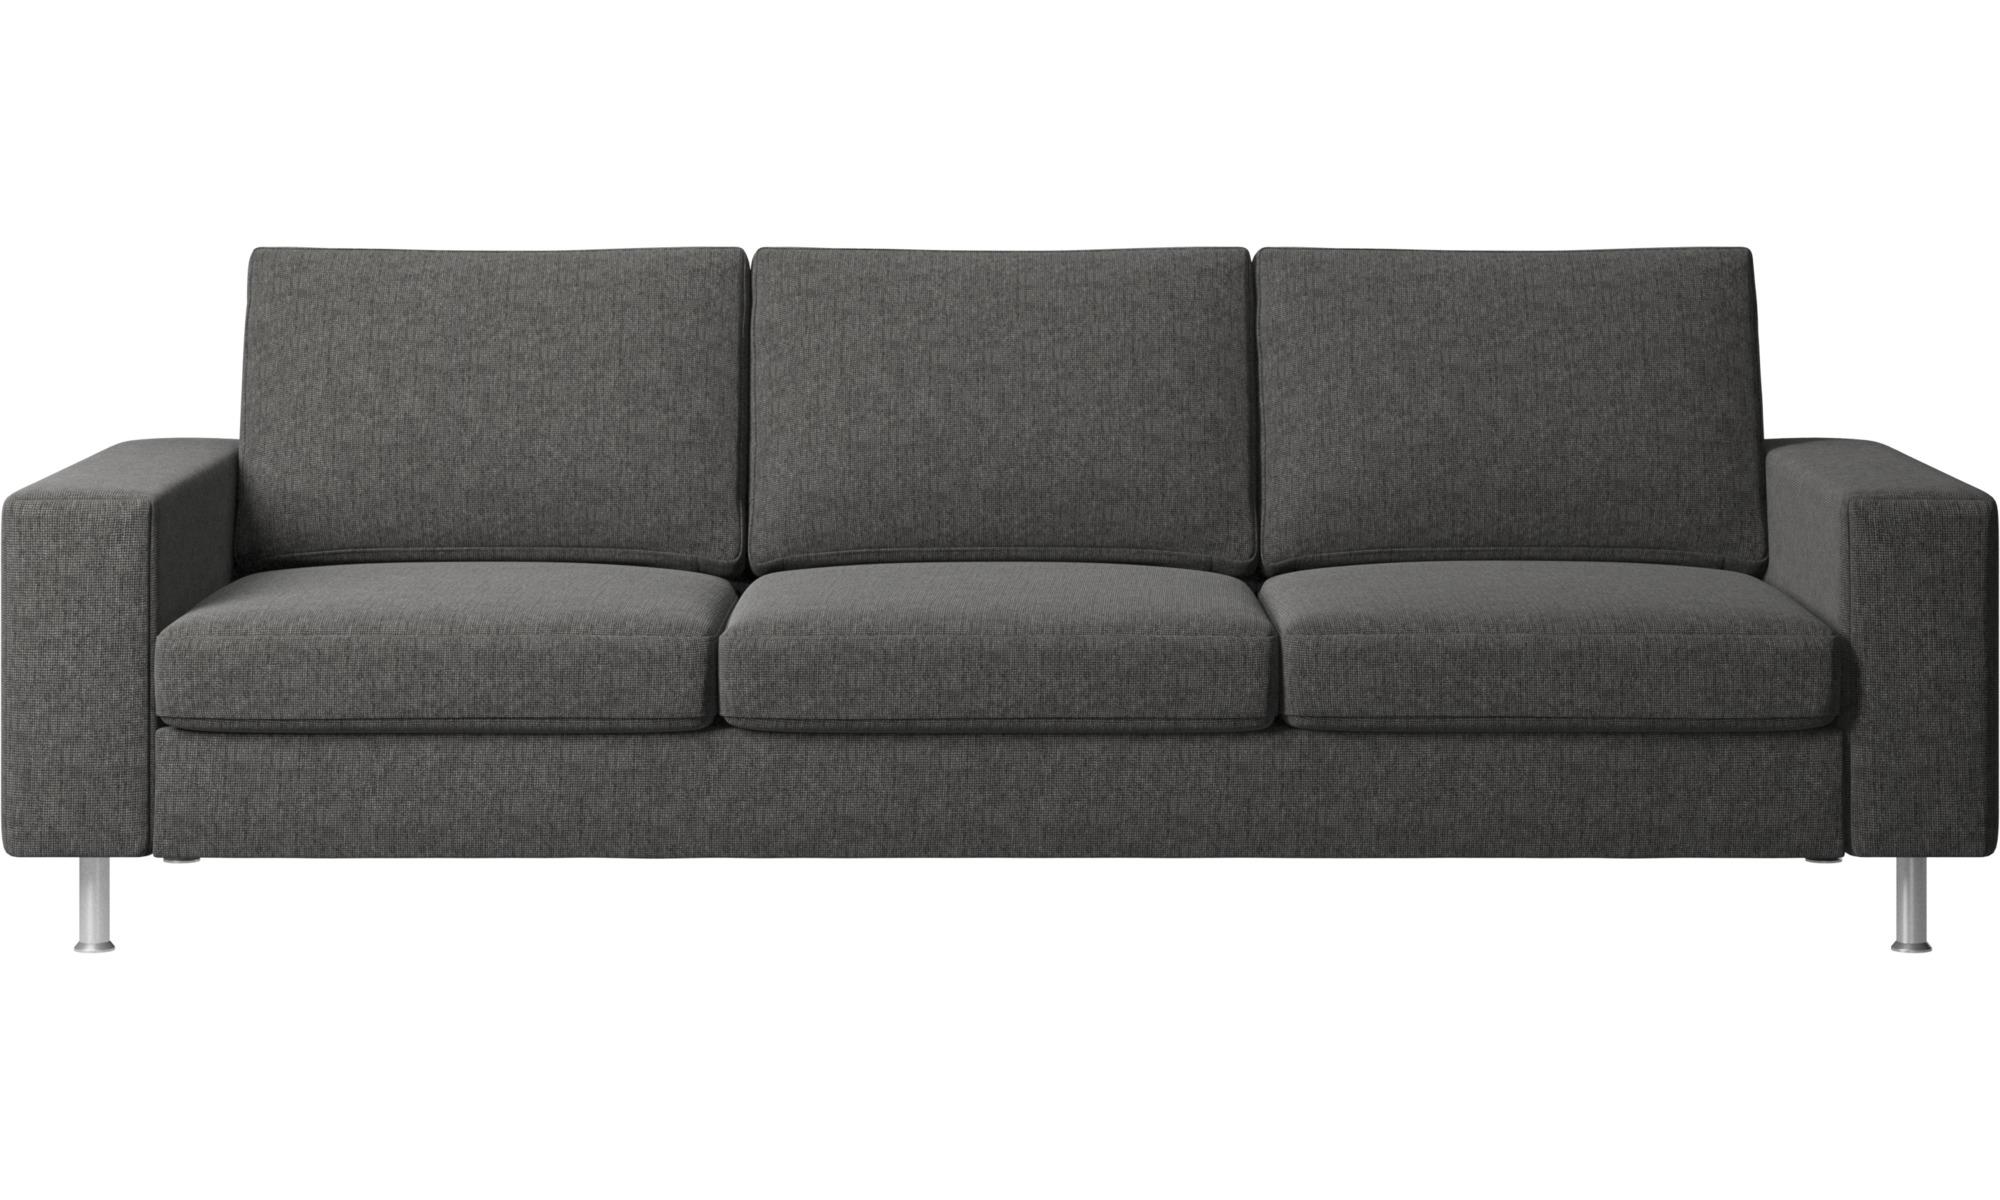 3 Seater Sofas Indivi 2 Sofa Gray Fabric